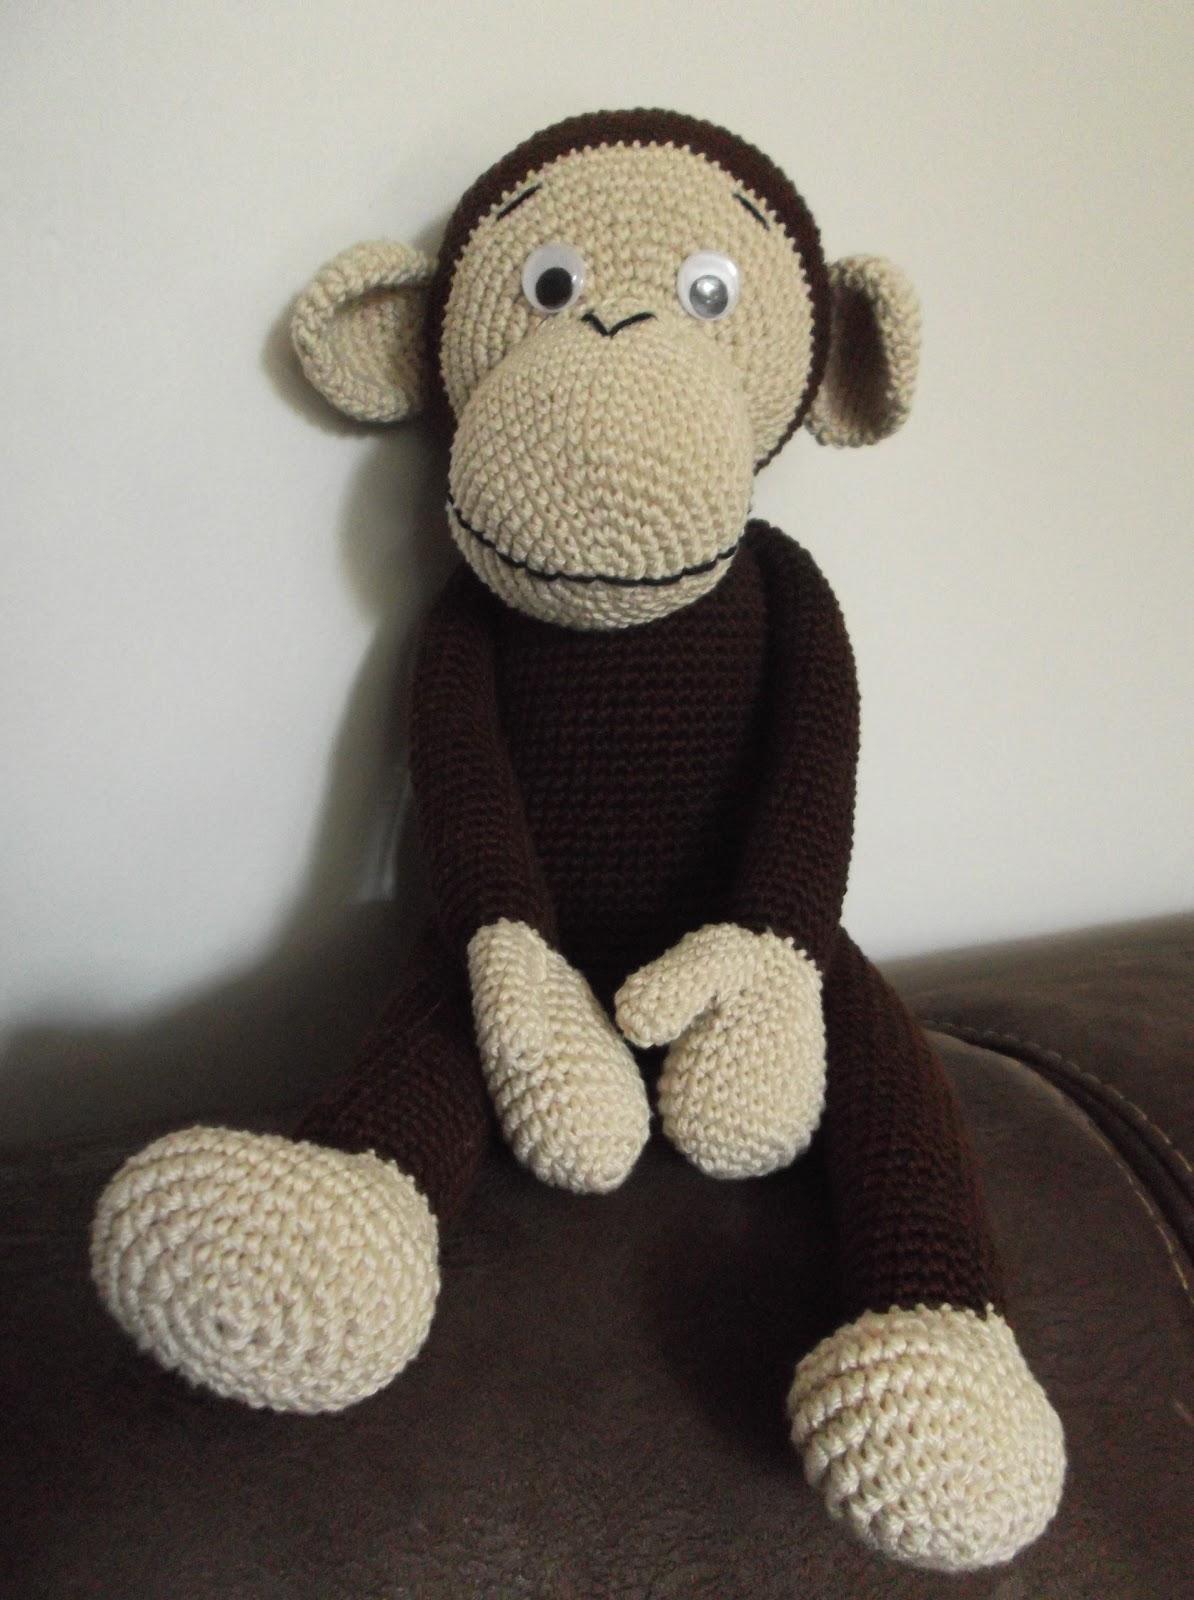 Haakydee Gehaakte Knuffel Aap Amigurimi Monkey